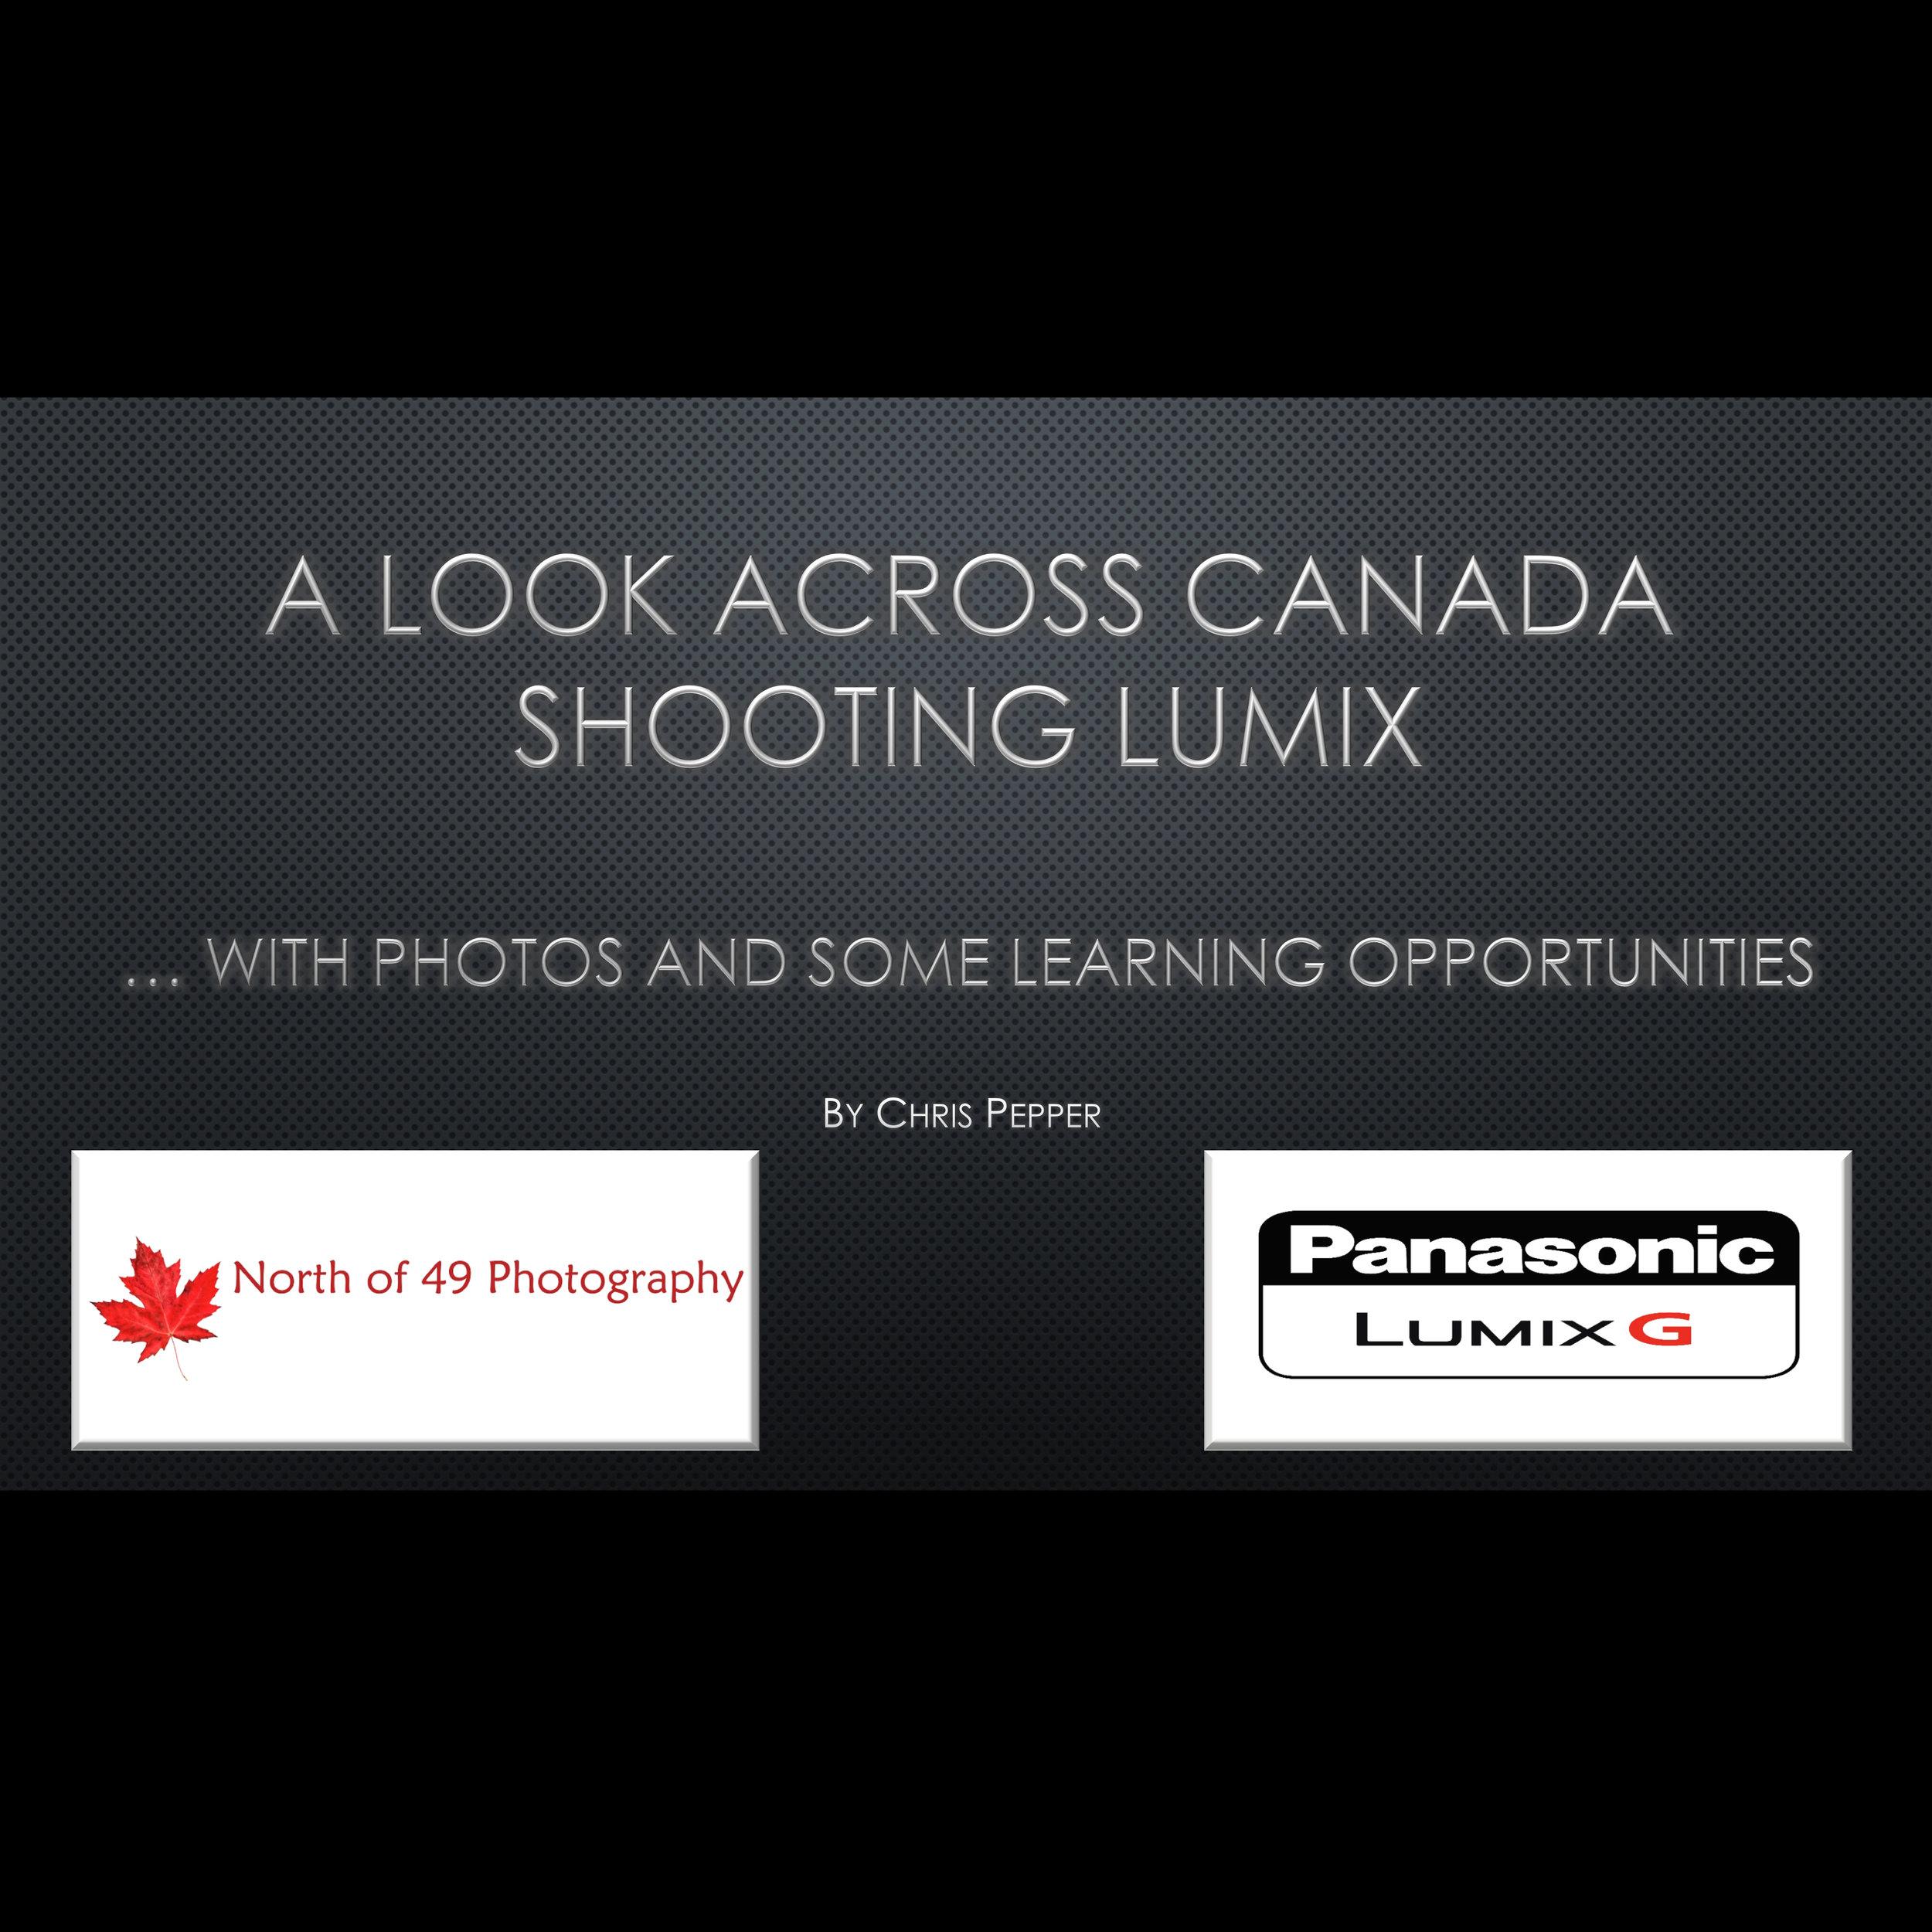 Lumix look across CanadaScreen Shot 2018-01-01 at 8.13.20 PM copy.jpg